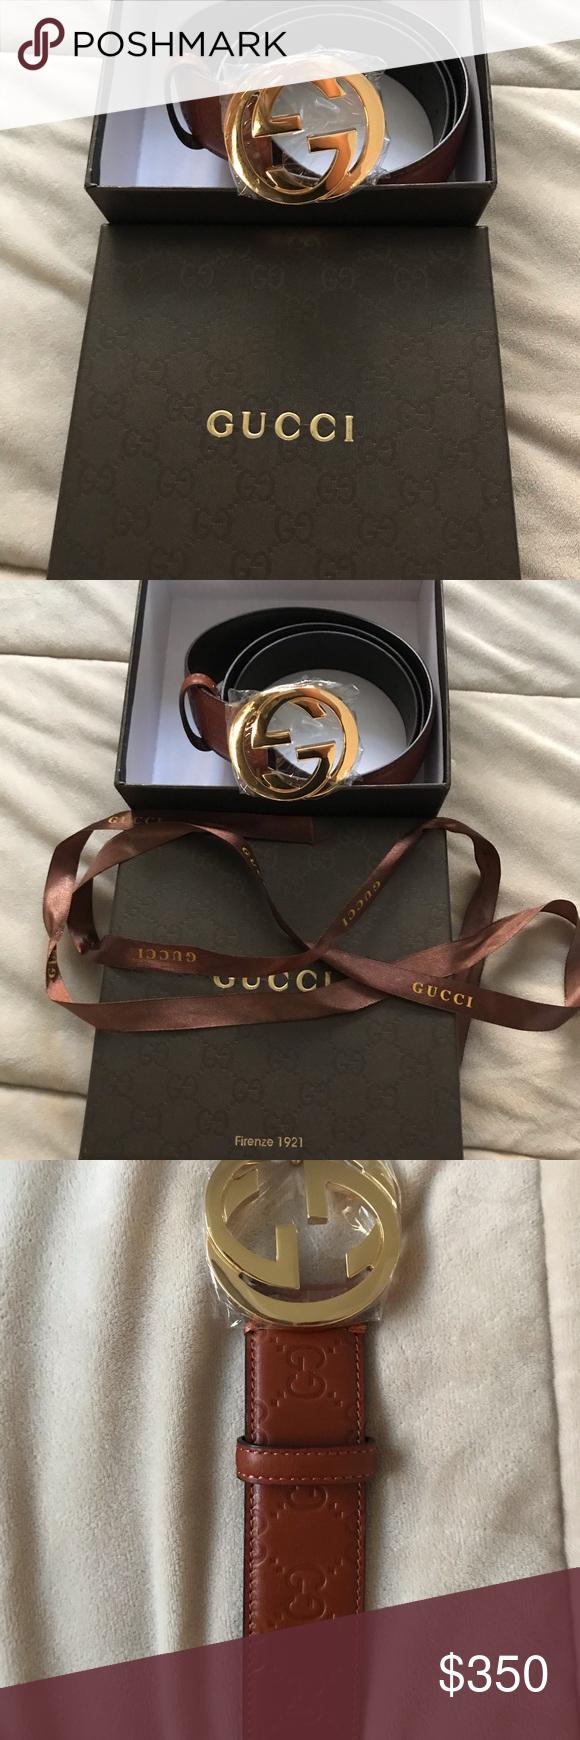 556869f03ed Gucci signature belt Brand new authentic Gucci belt size 44